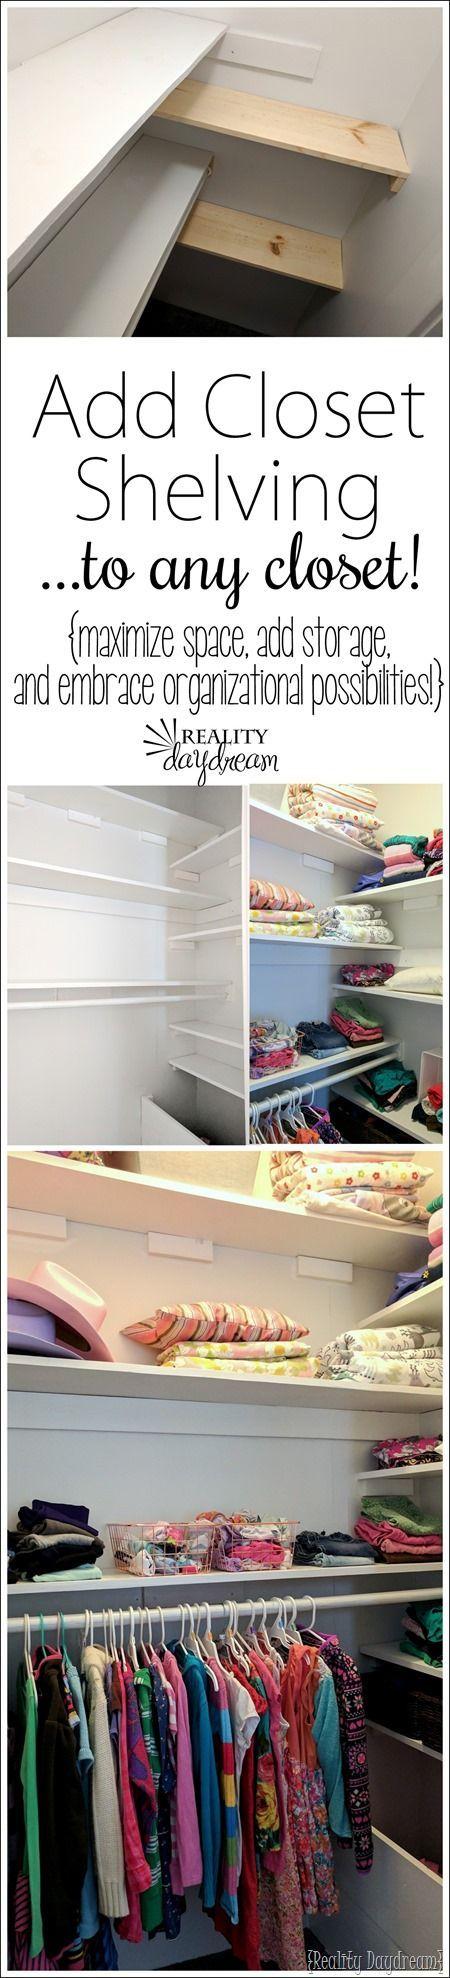 ADD CLOSET SHELVING To Any Basic Closet